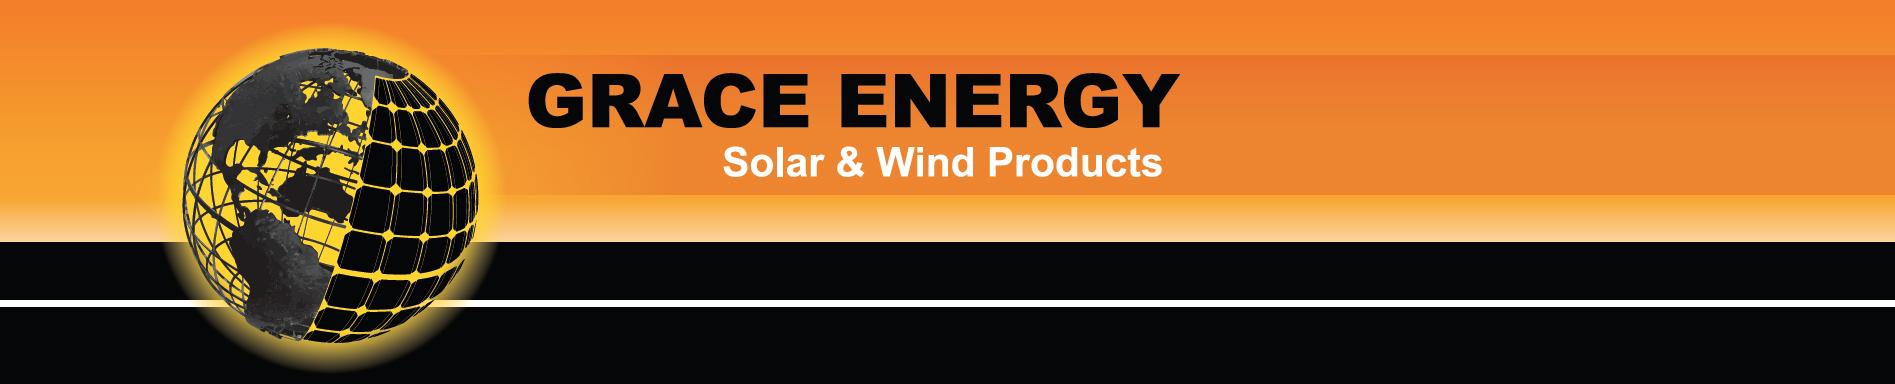 Grace Energy Header